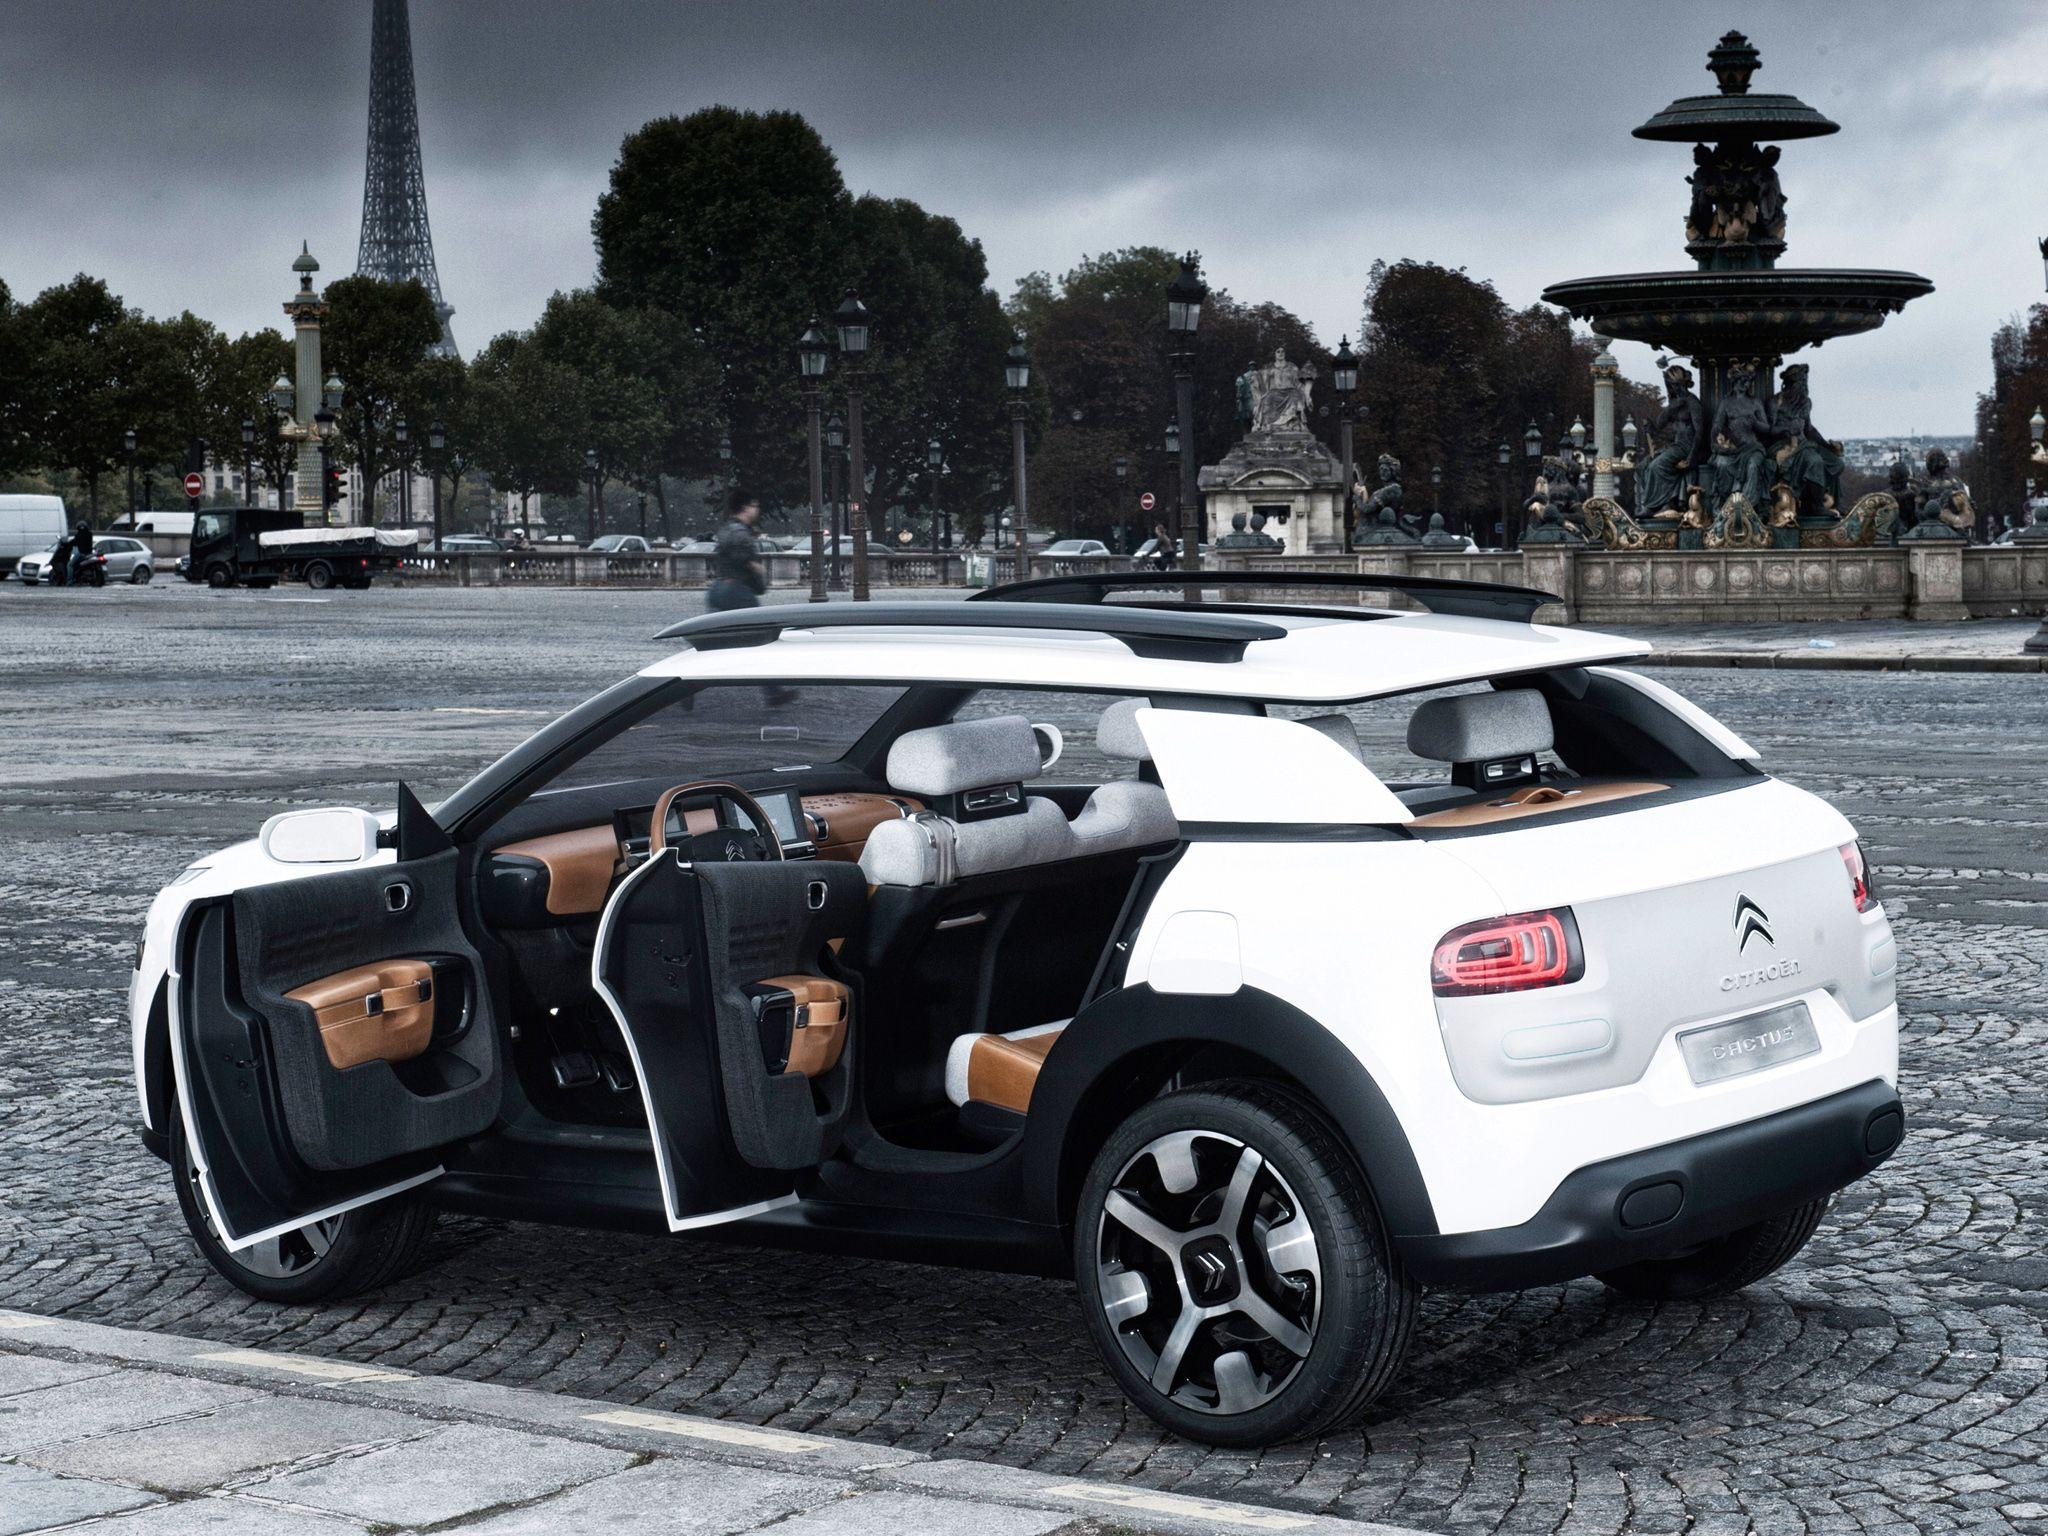 citroen cactus cactus lifestyle citroen car cars e. Black Bedroom Furniture Sets. Home Design Ideas